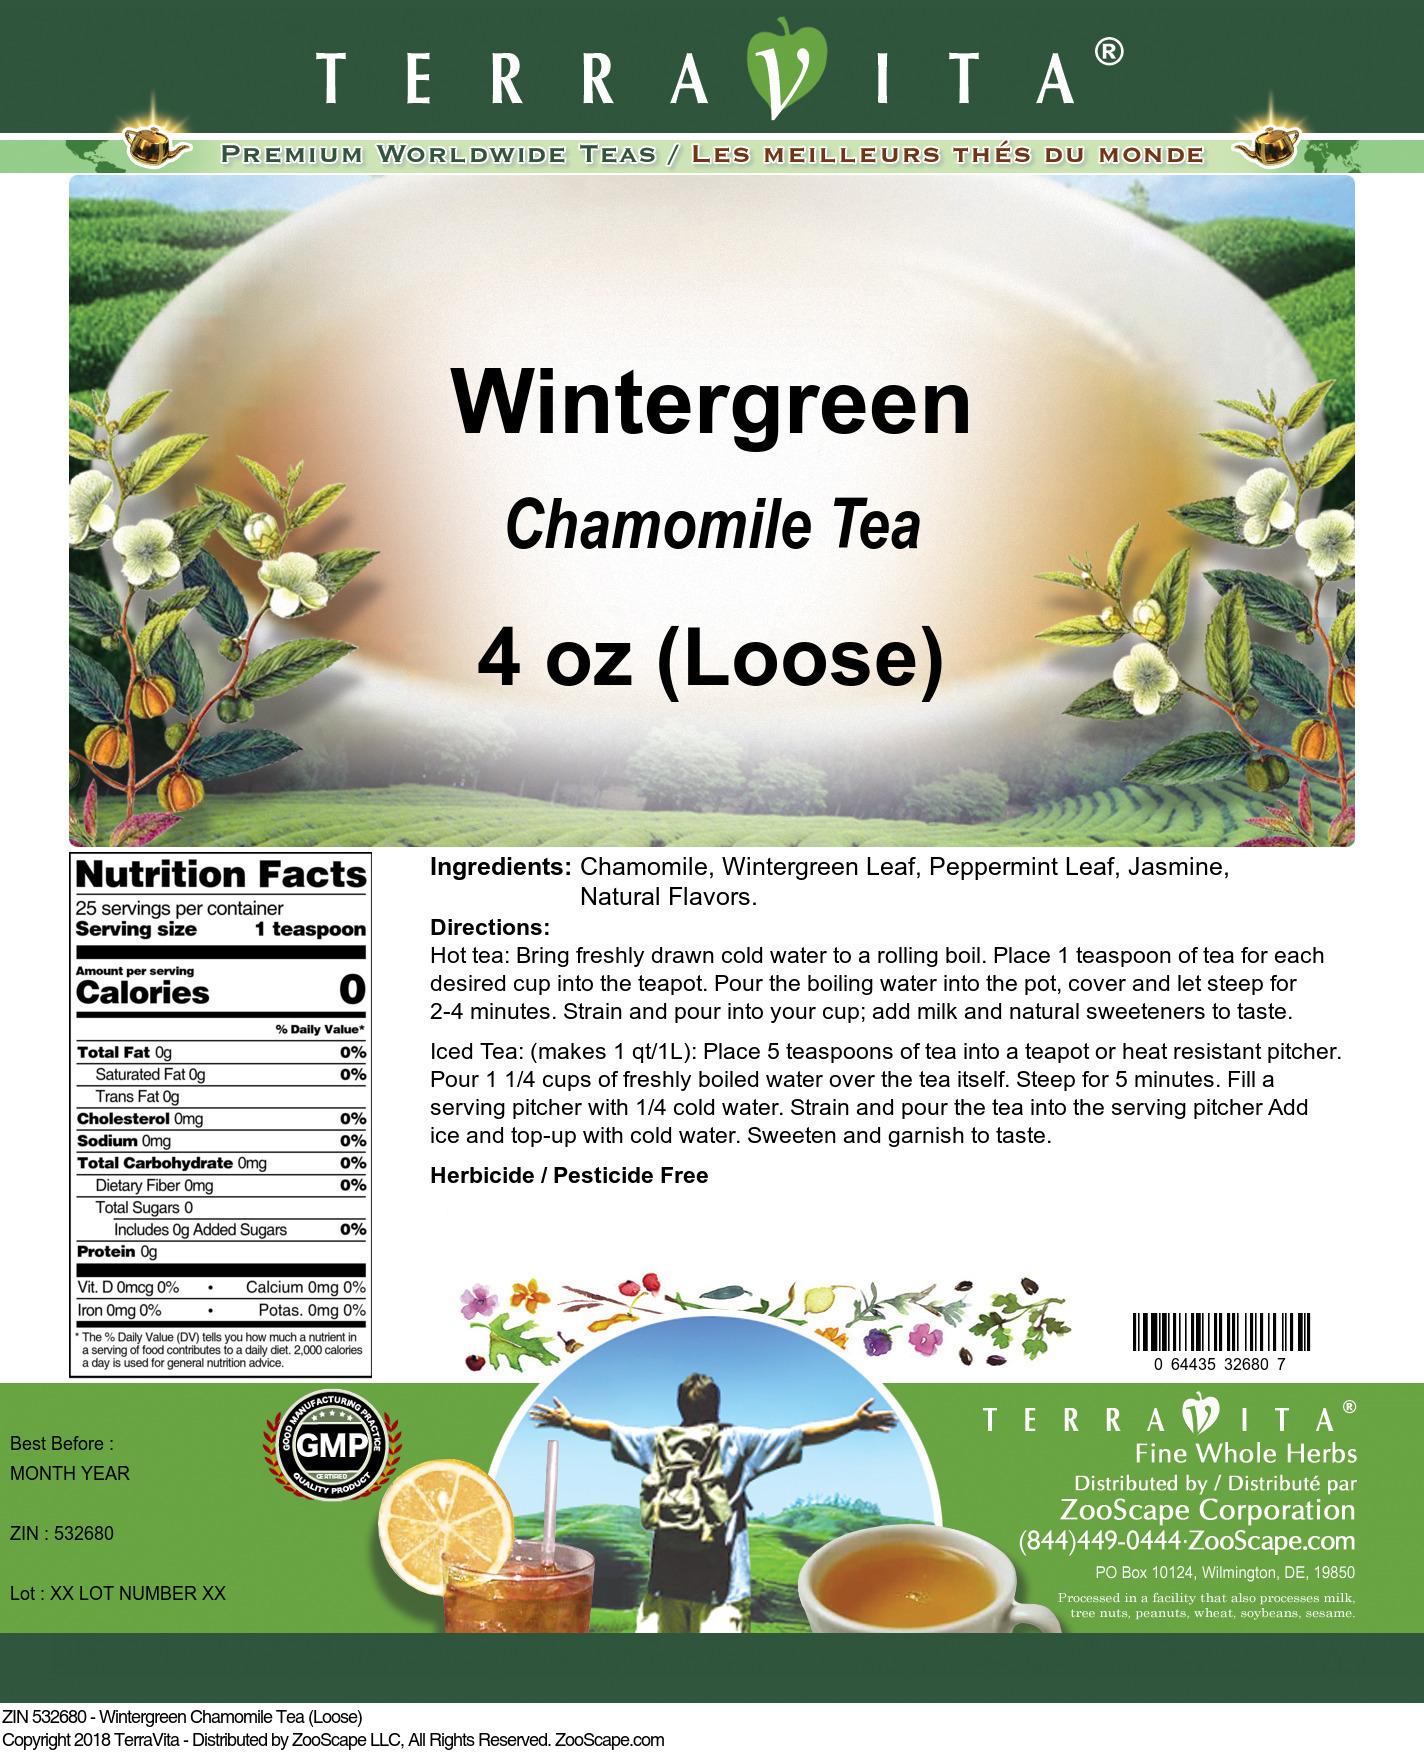 Wintergreen Chamomile Tea